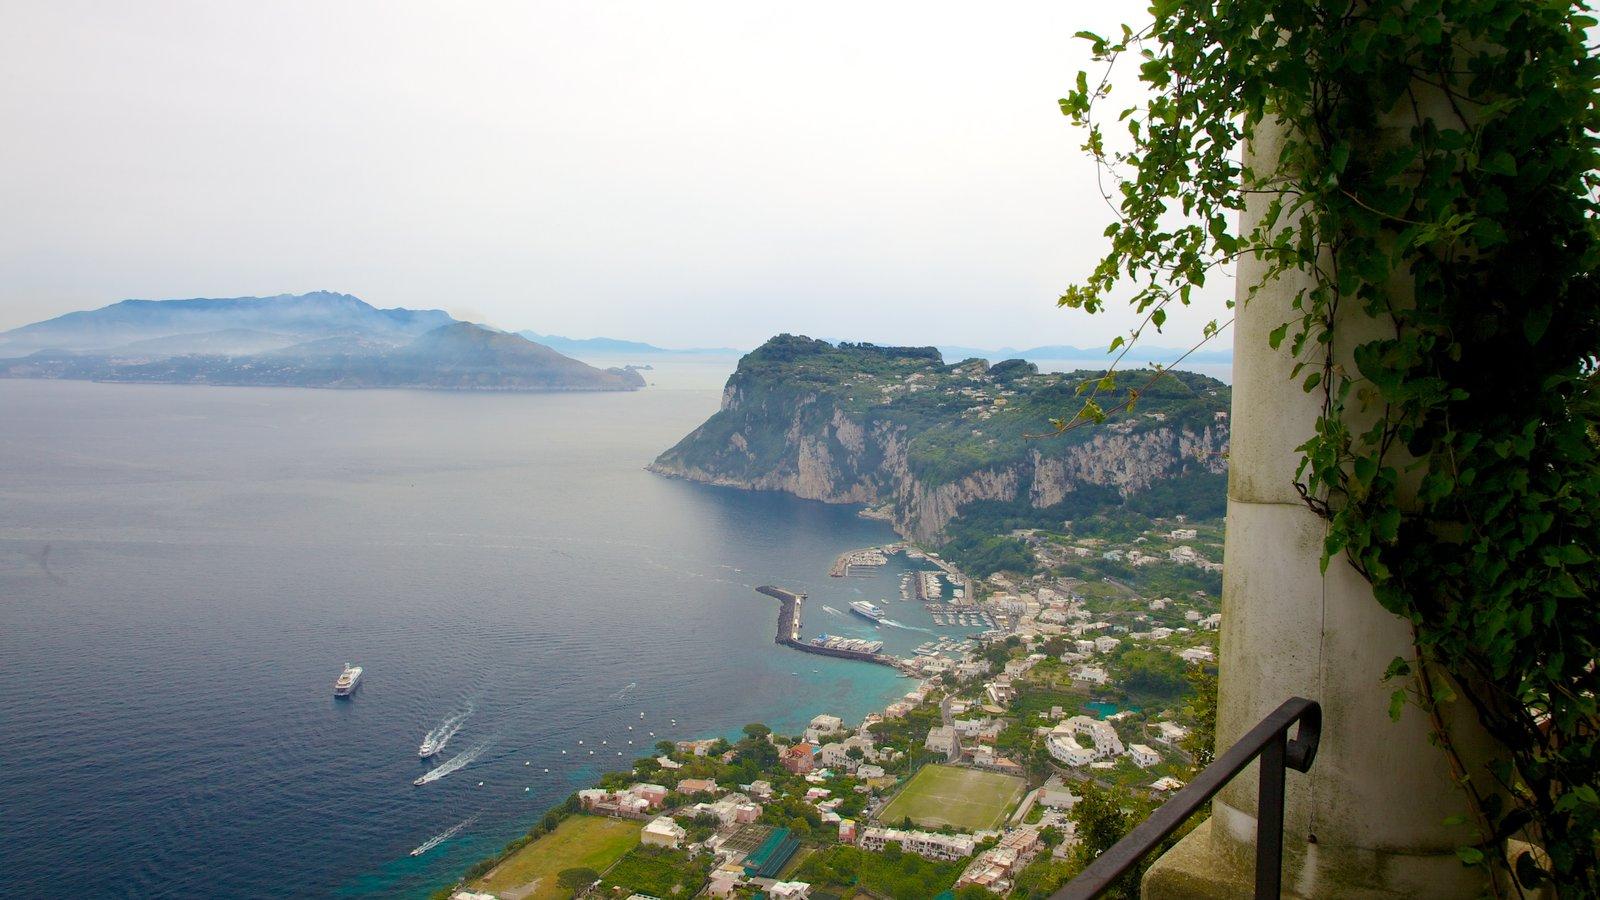 Villa San Michele featuring general coastal views, a coastal town and landscape views